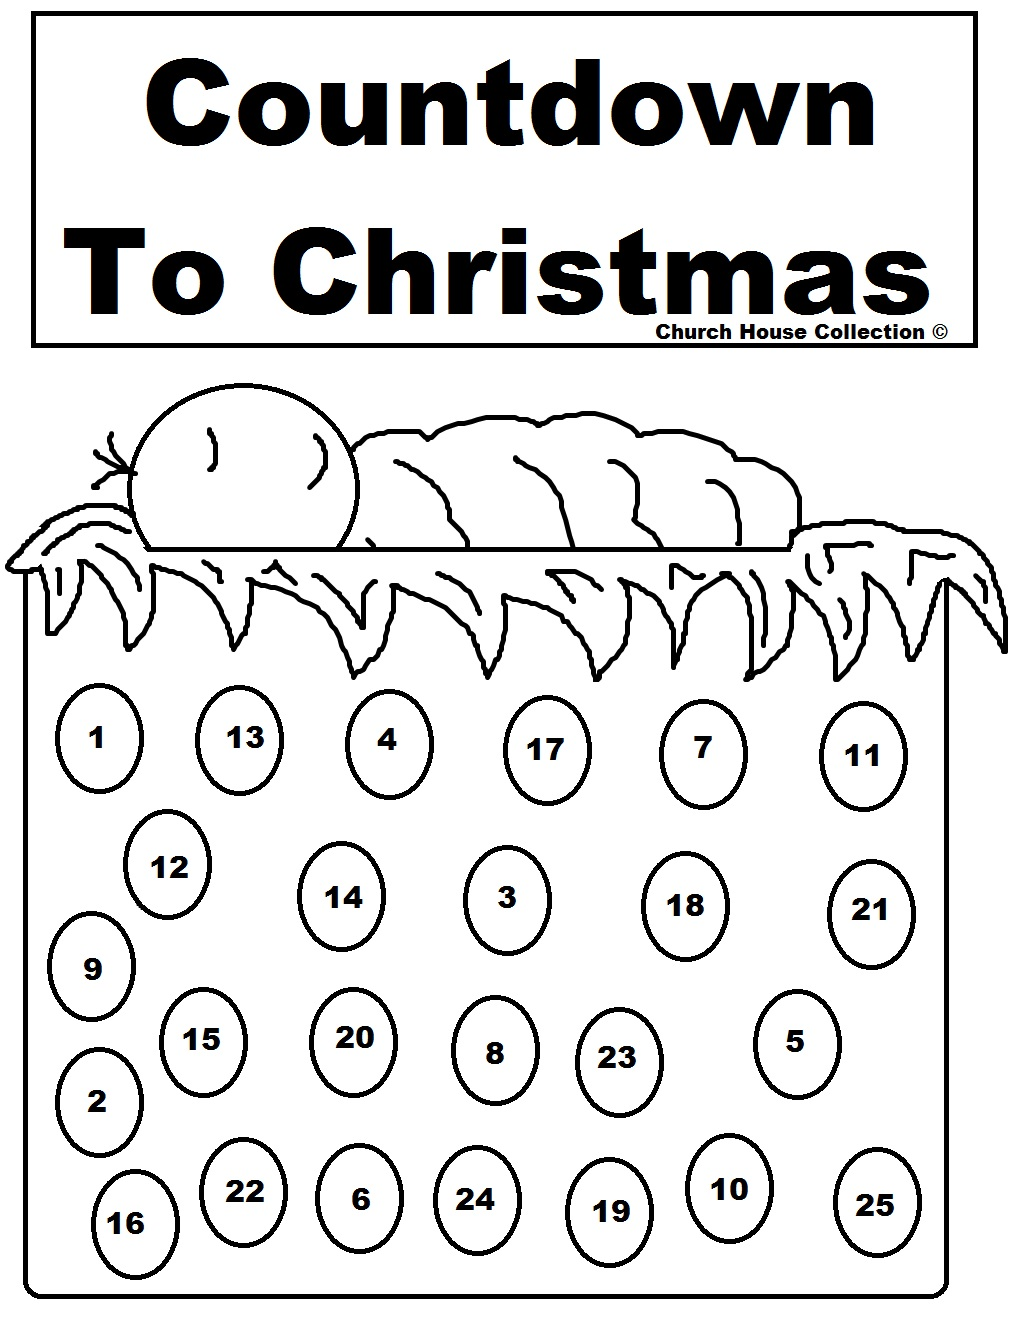 Church House Collection Blog: Baby Jesus Advent Calendar For Christmas